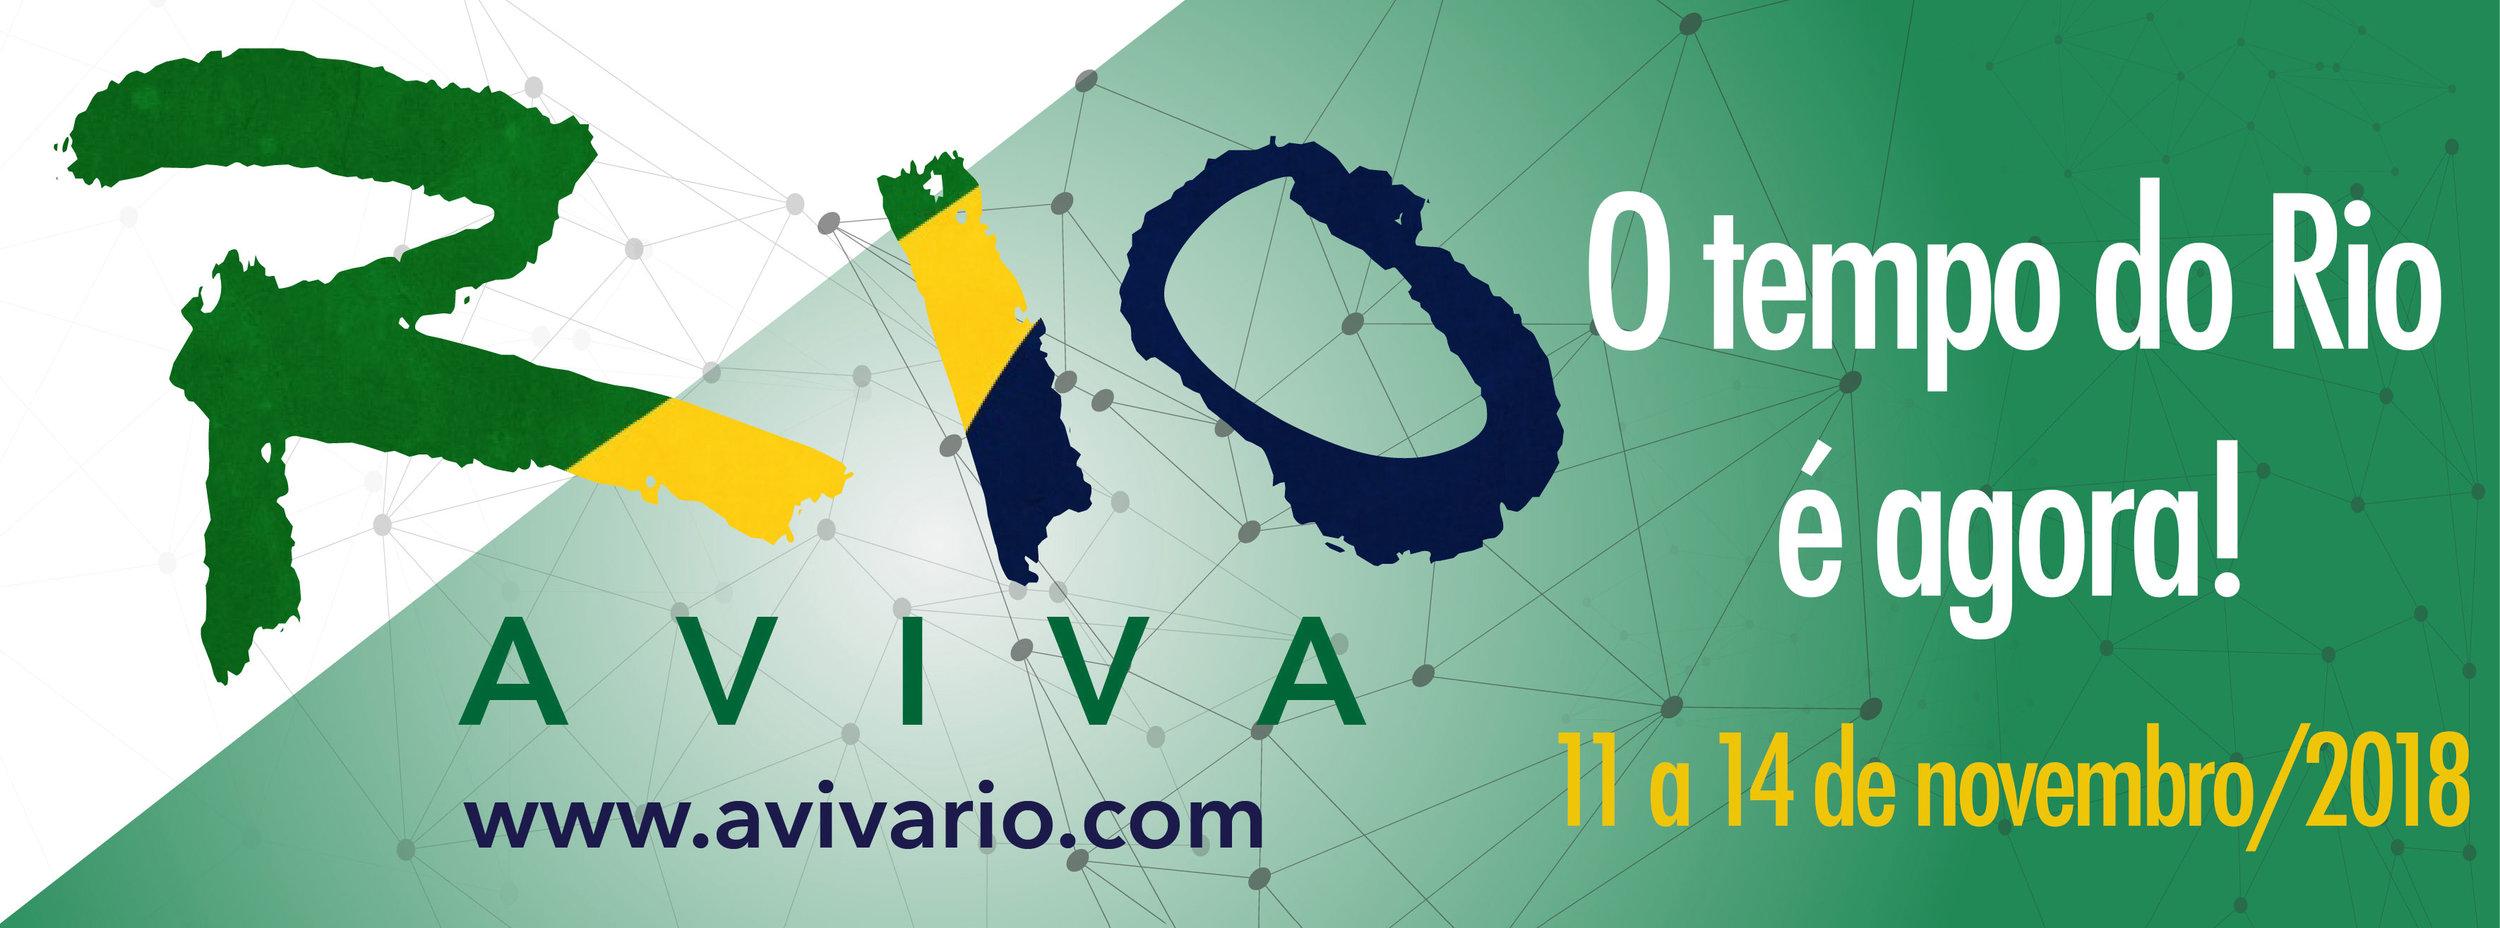 RioRevived-Template-FINAL-Portuguese-FB.jpg